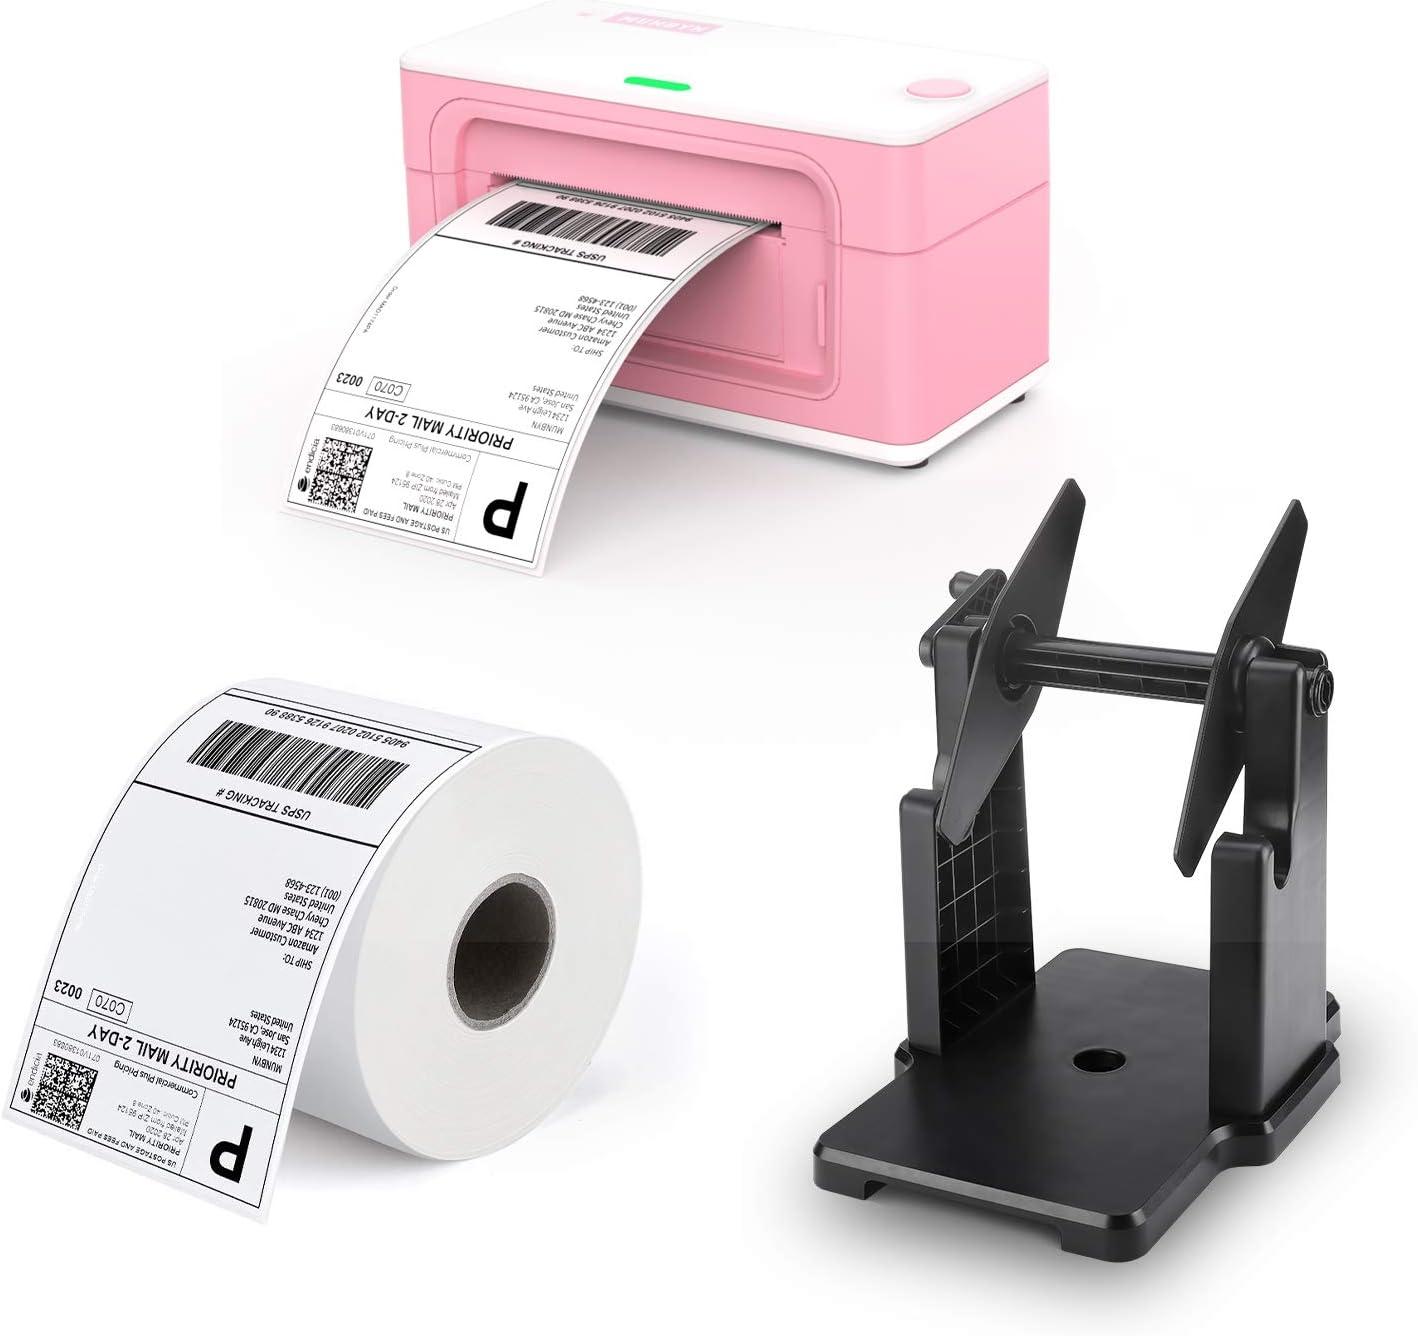 Pink Shipping Label Printer, [Upgraded 2.0] MUNBYN Label Printer Maker MUNBYN Thermal Direct Shipping Label MUNBYN External Rolls Label Holder